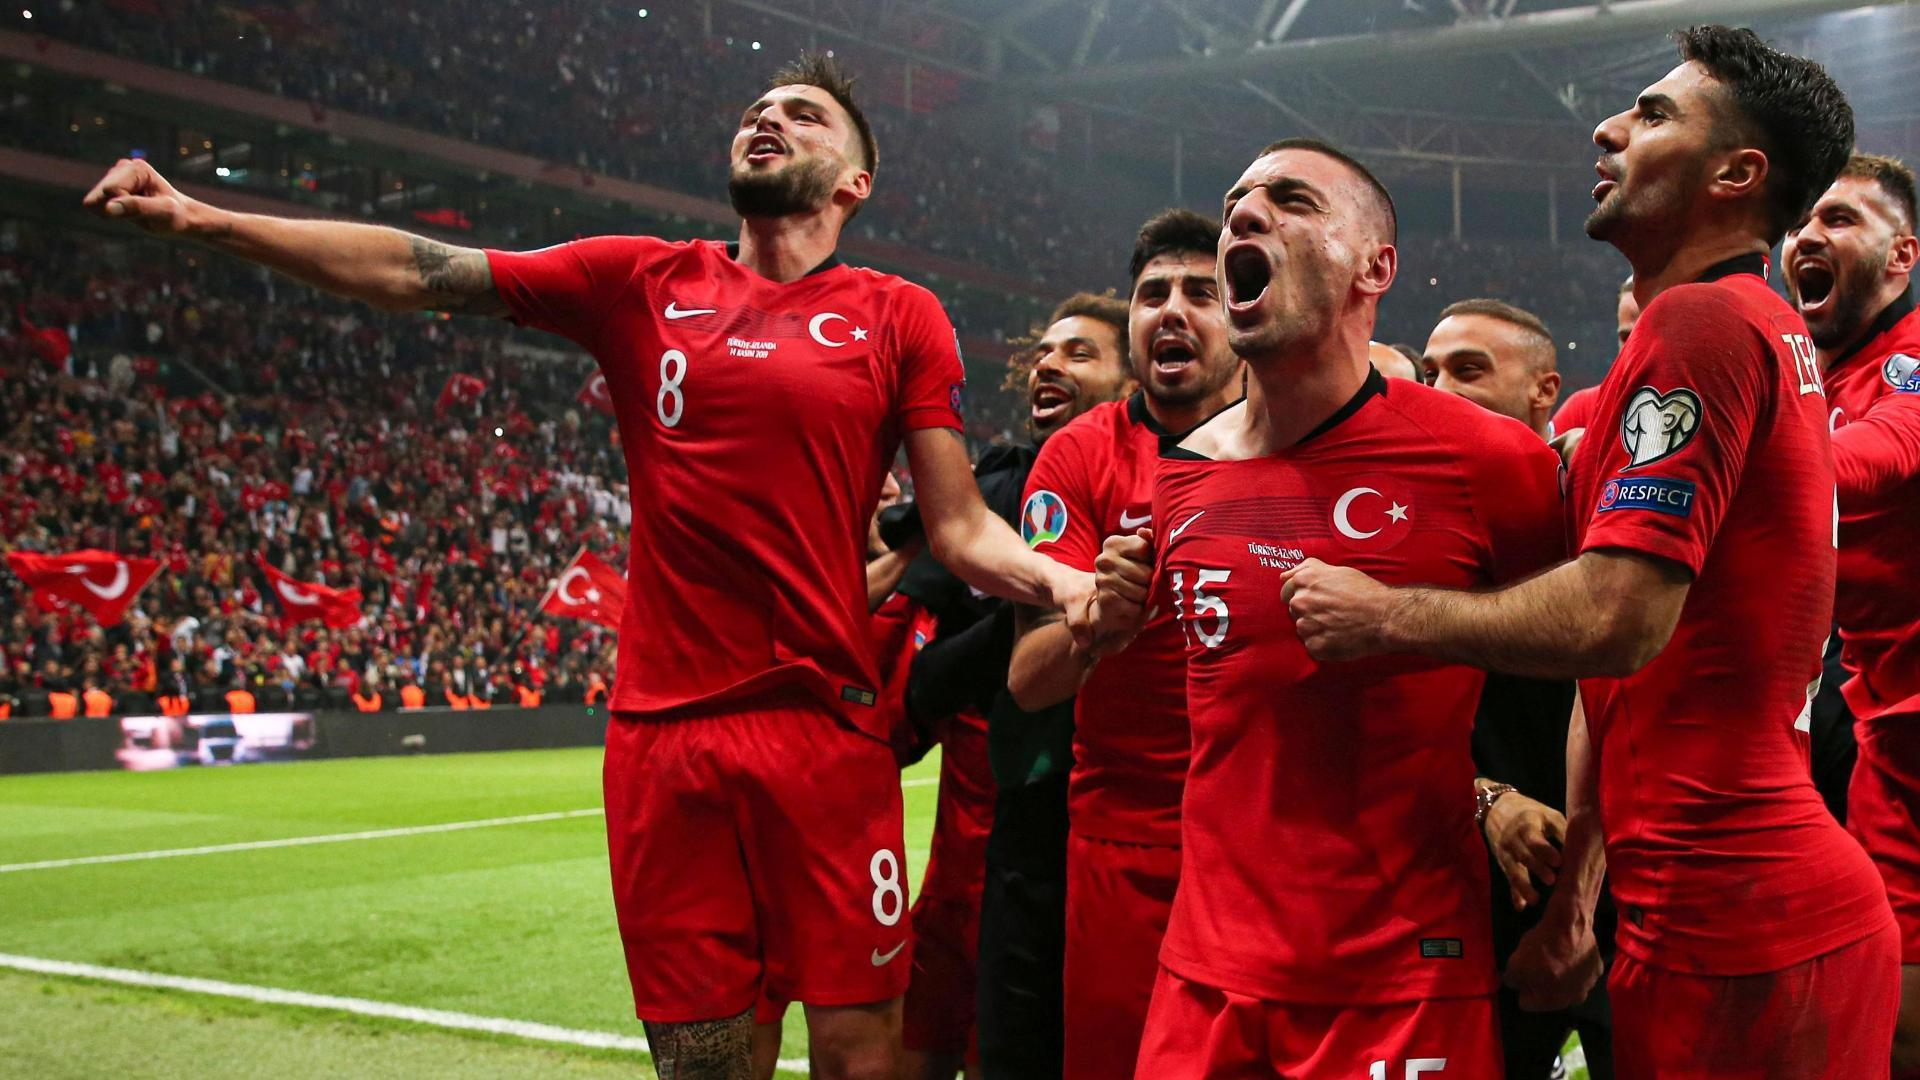 Turkey secure Euro 2020 berth in tense draw